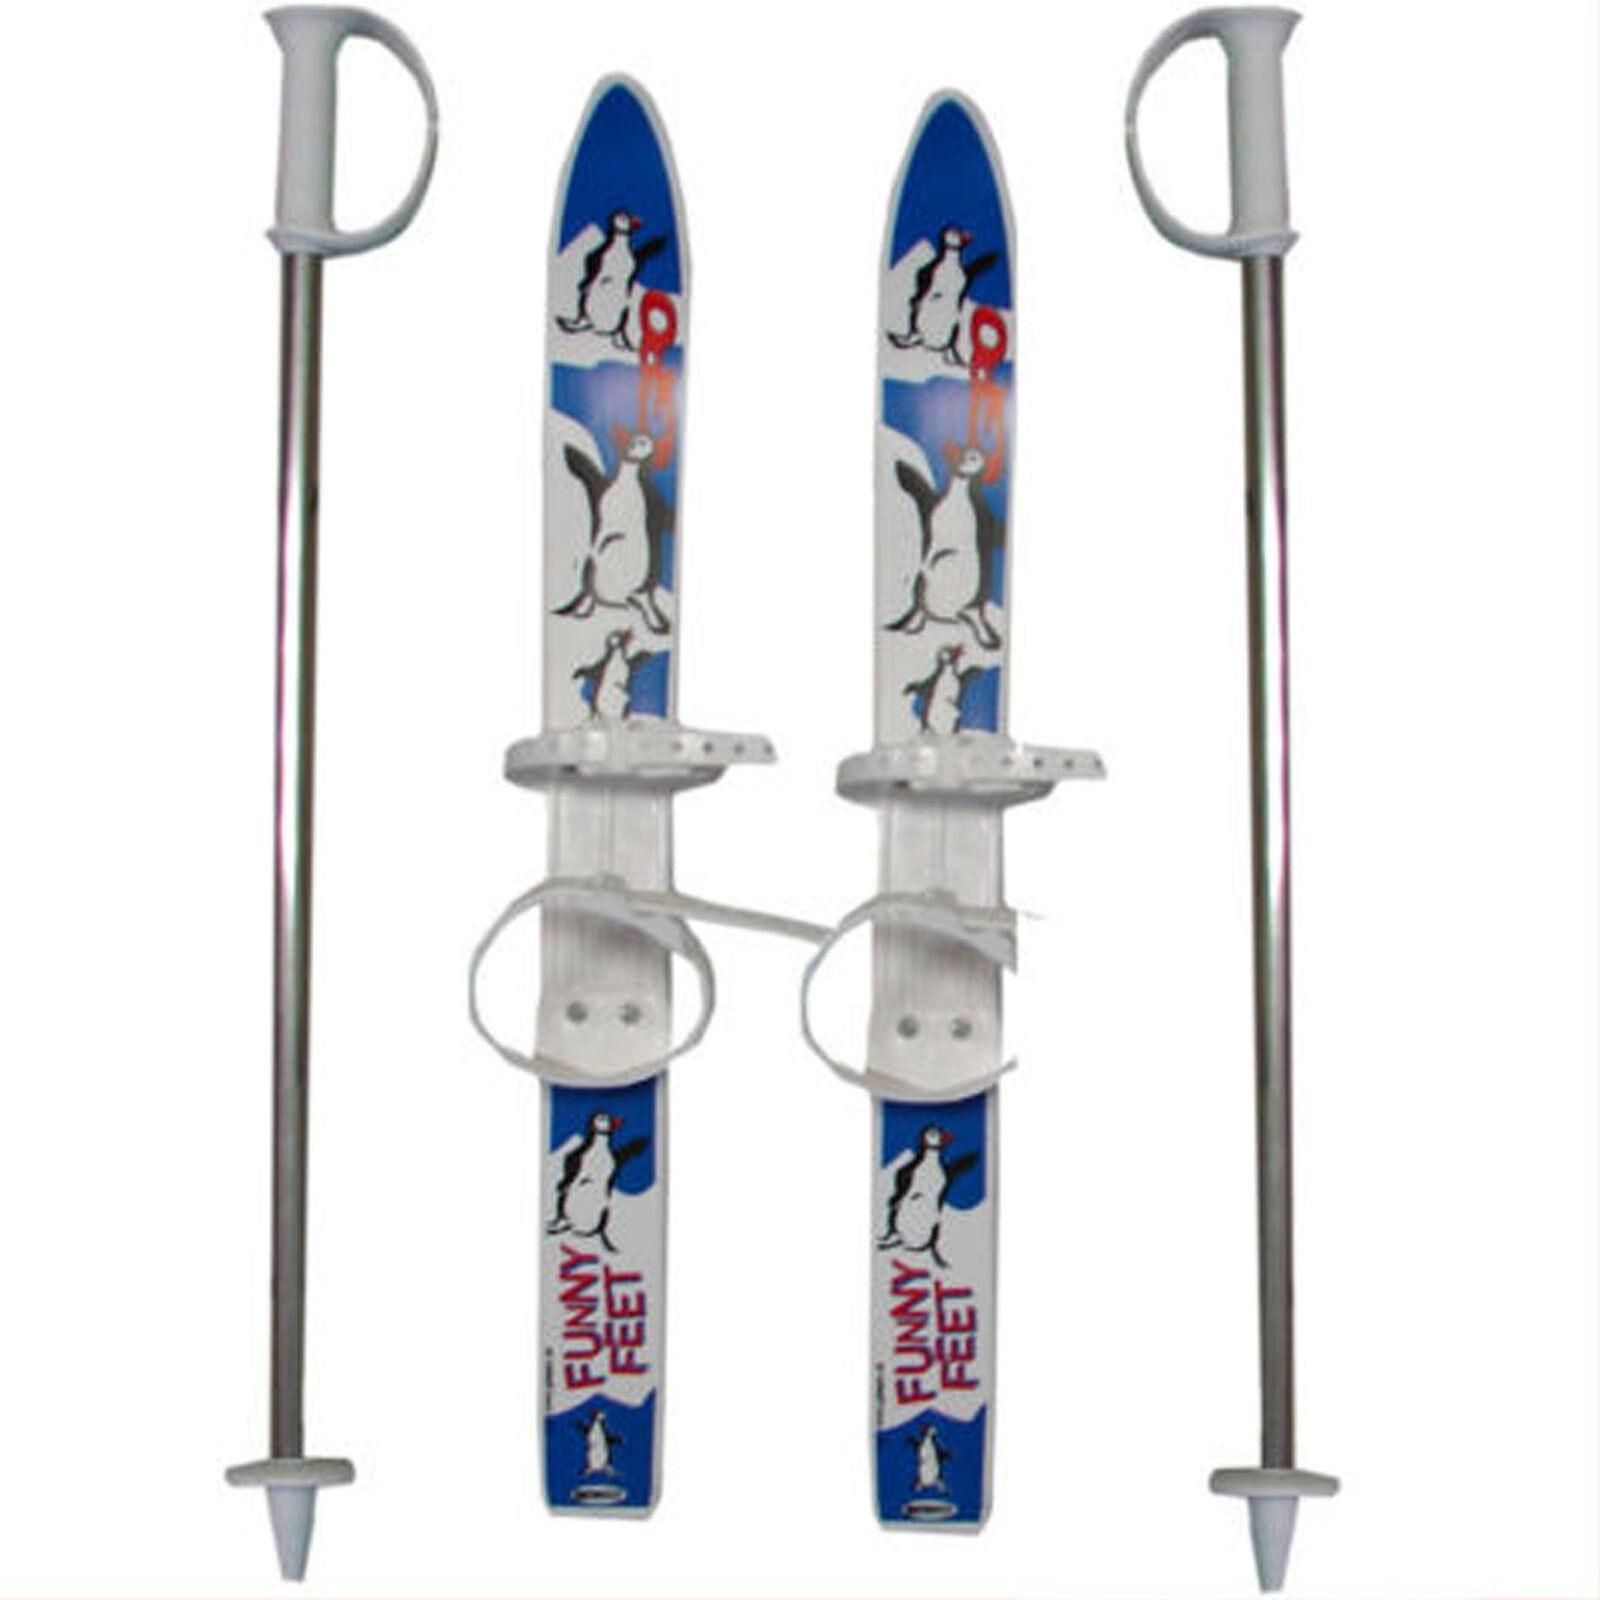 V3TEC Bambini Rutscher Einsteiger-Ski Plastica Sci-Bambini Anfänger-set &